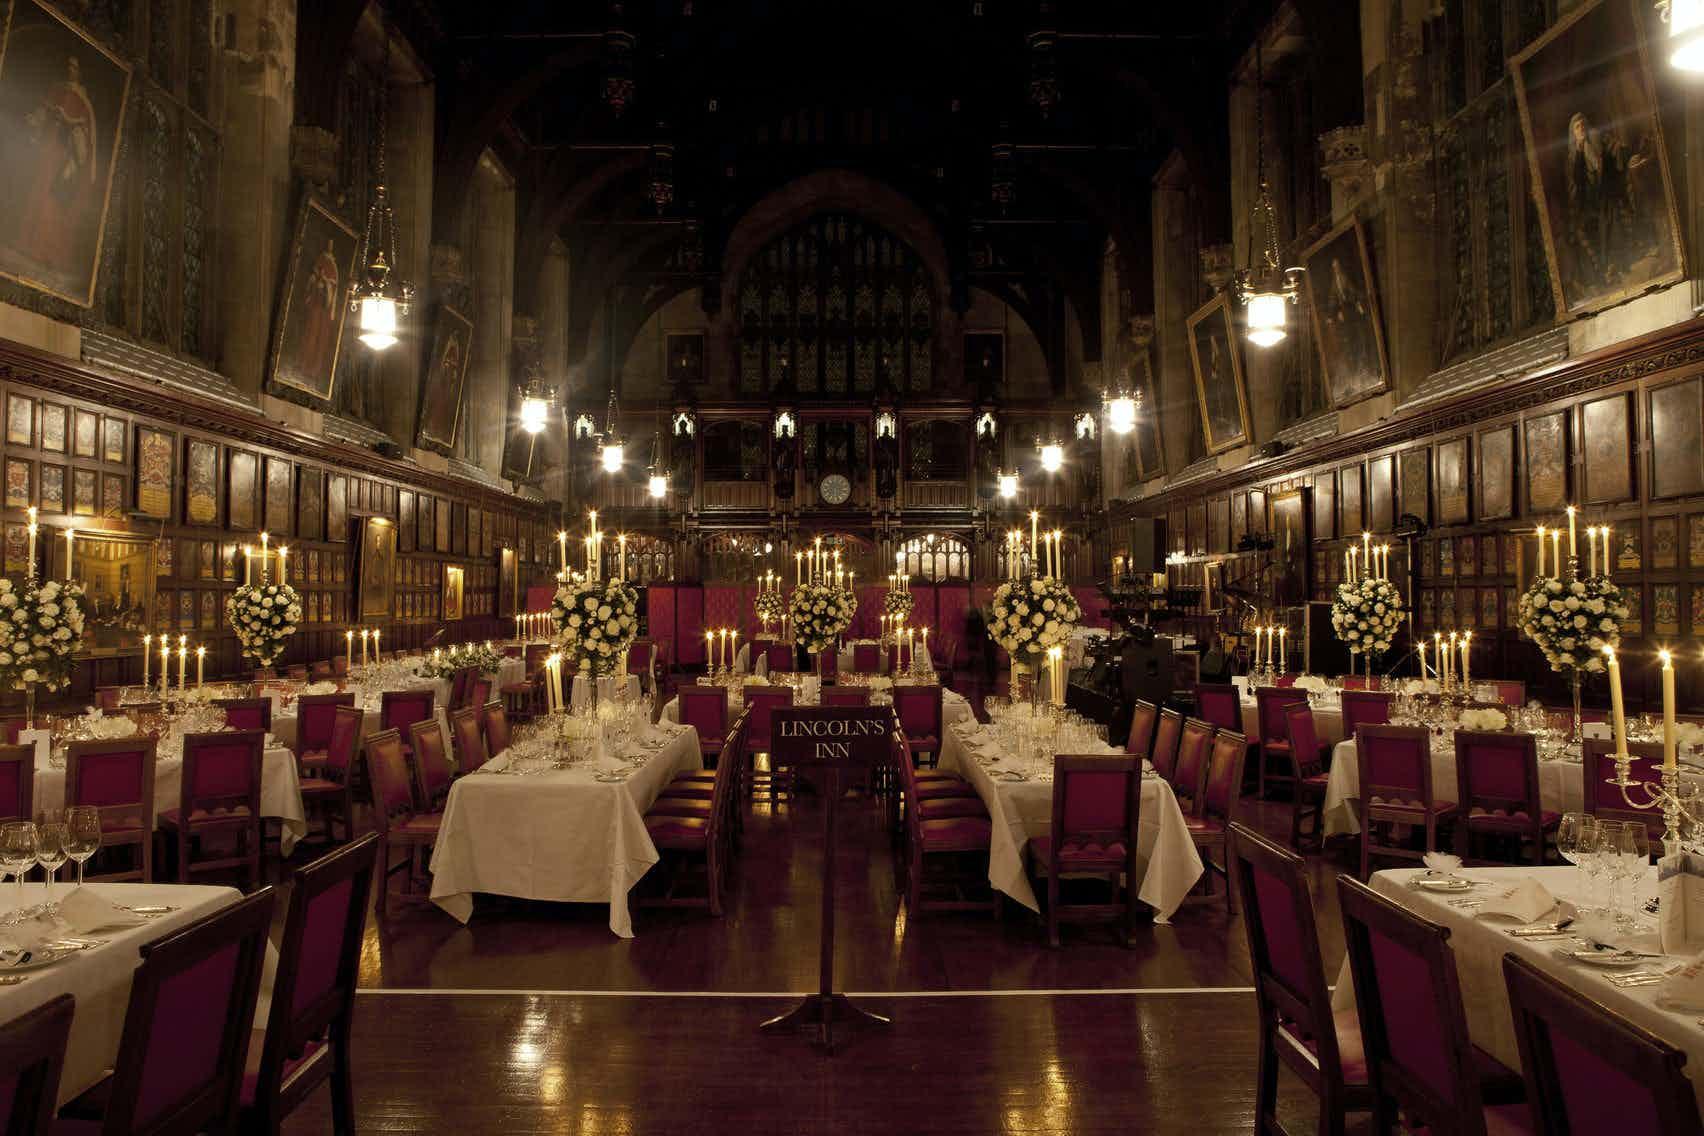 Great Hall, Lincoln's Inn